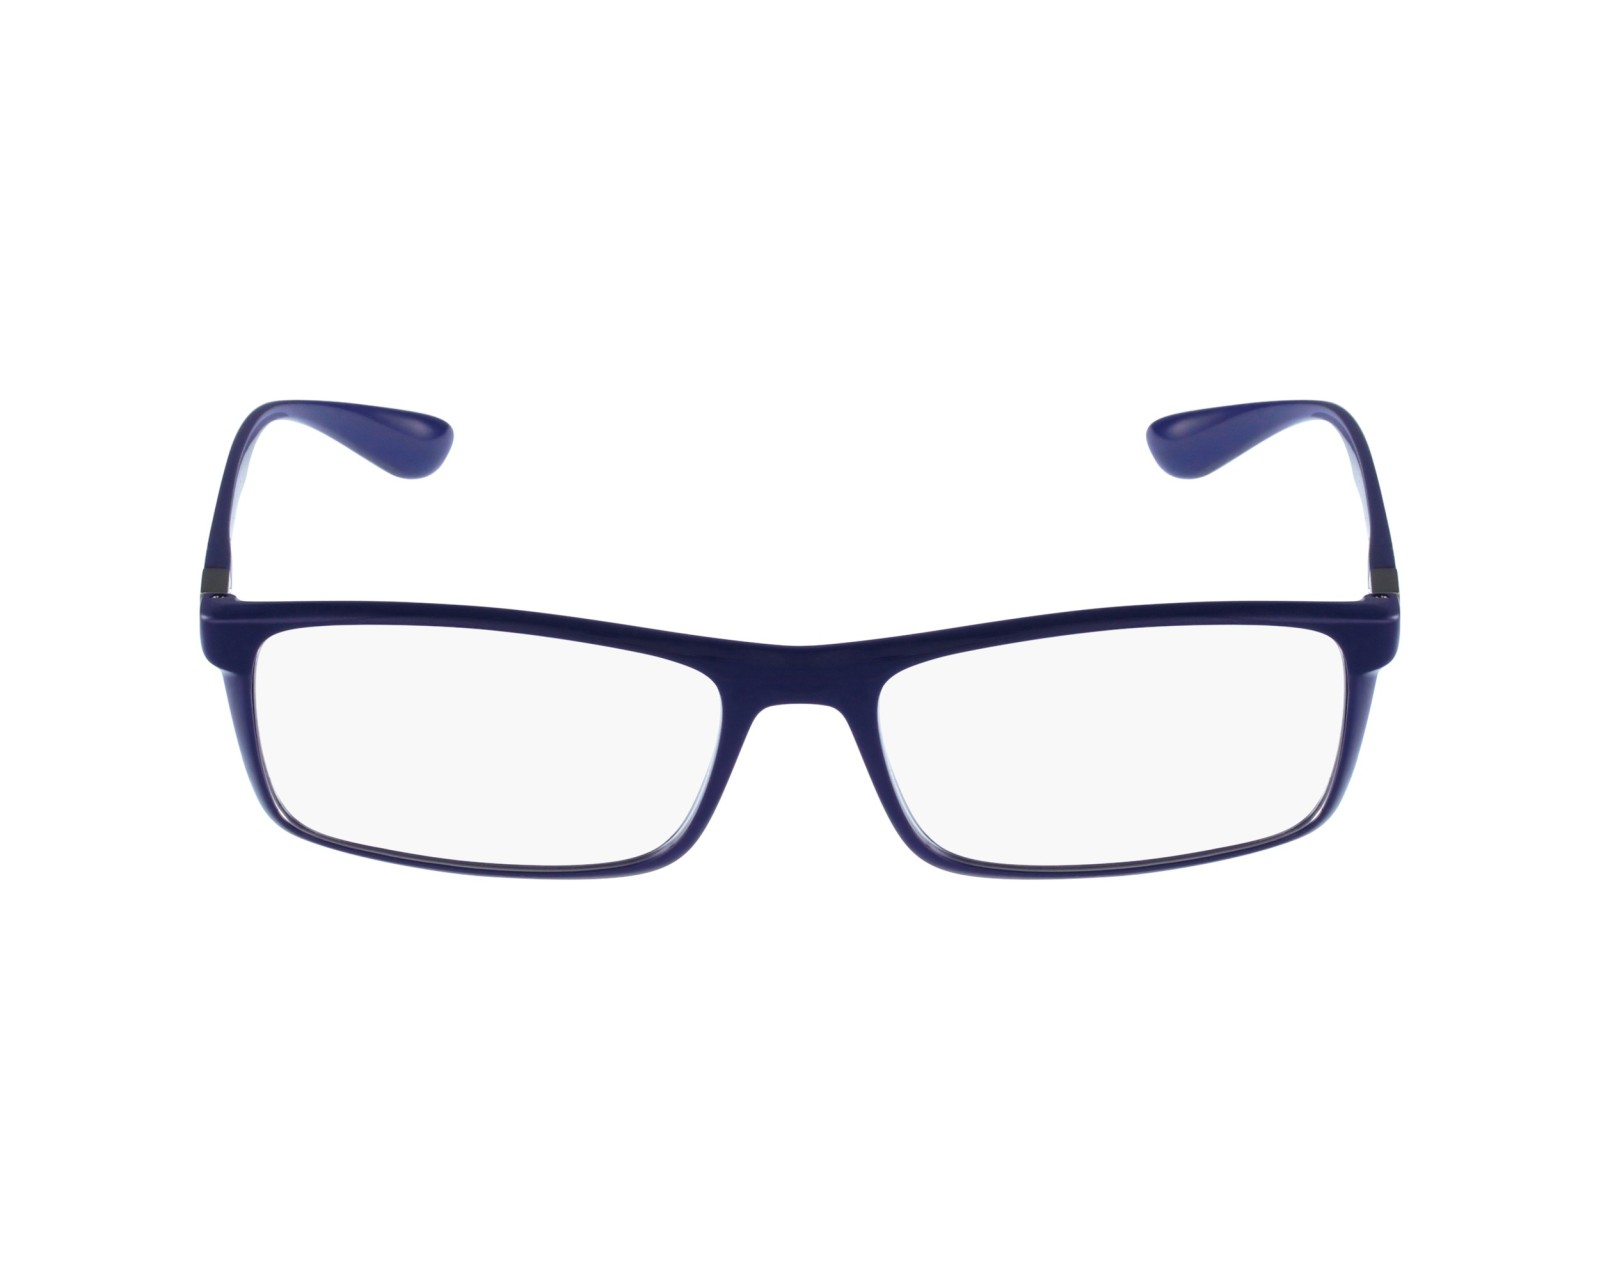 86770c8ced eyeglasses Ray-Ban RX-7035 5431 - Blue profile view